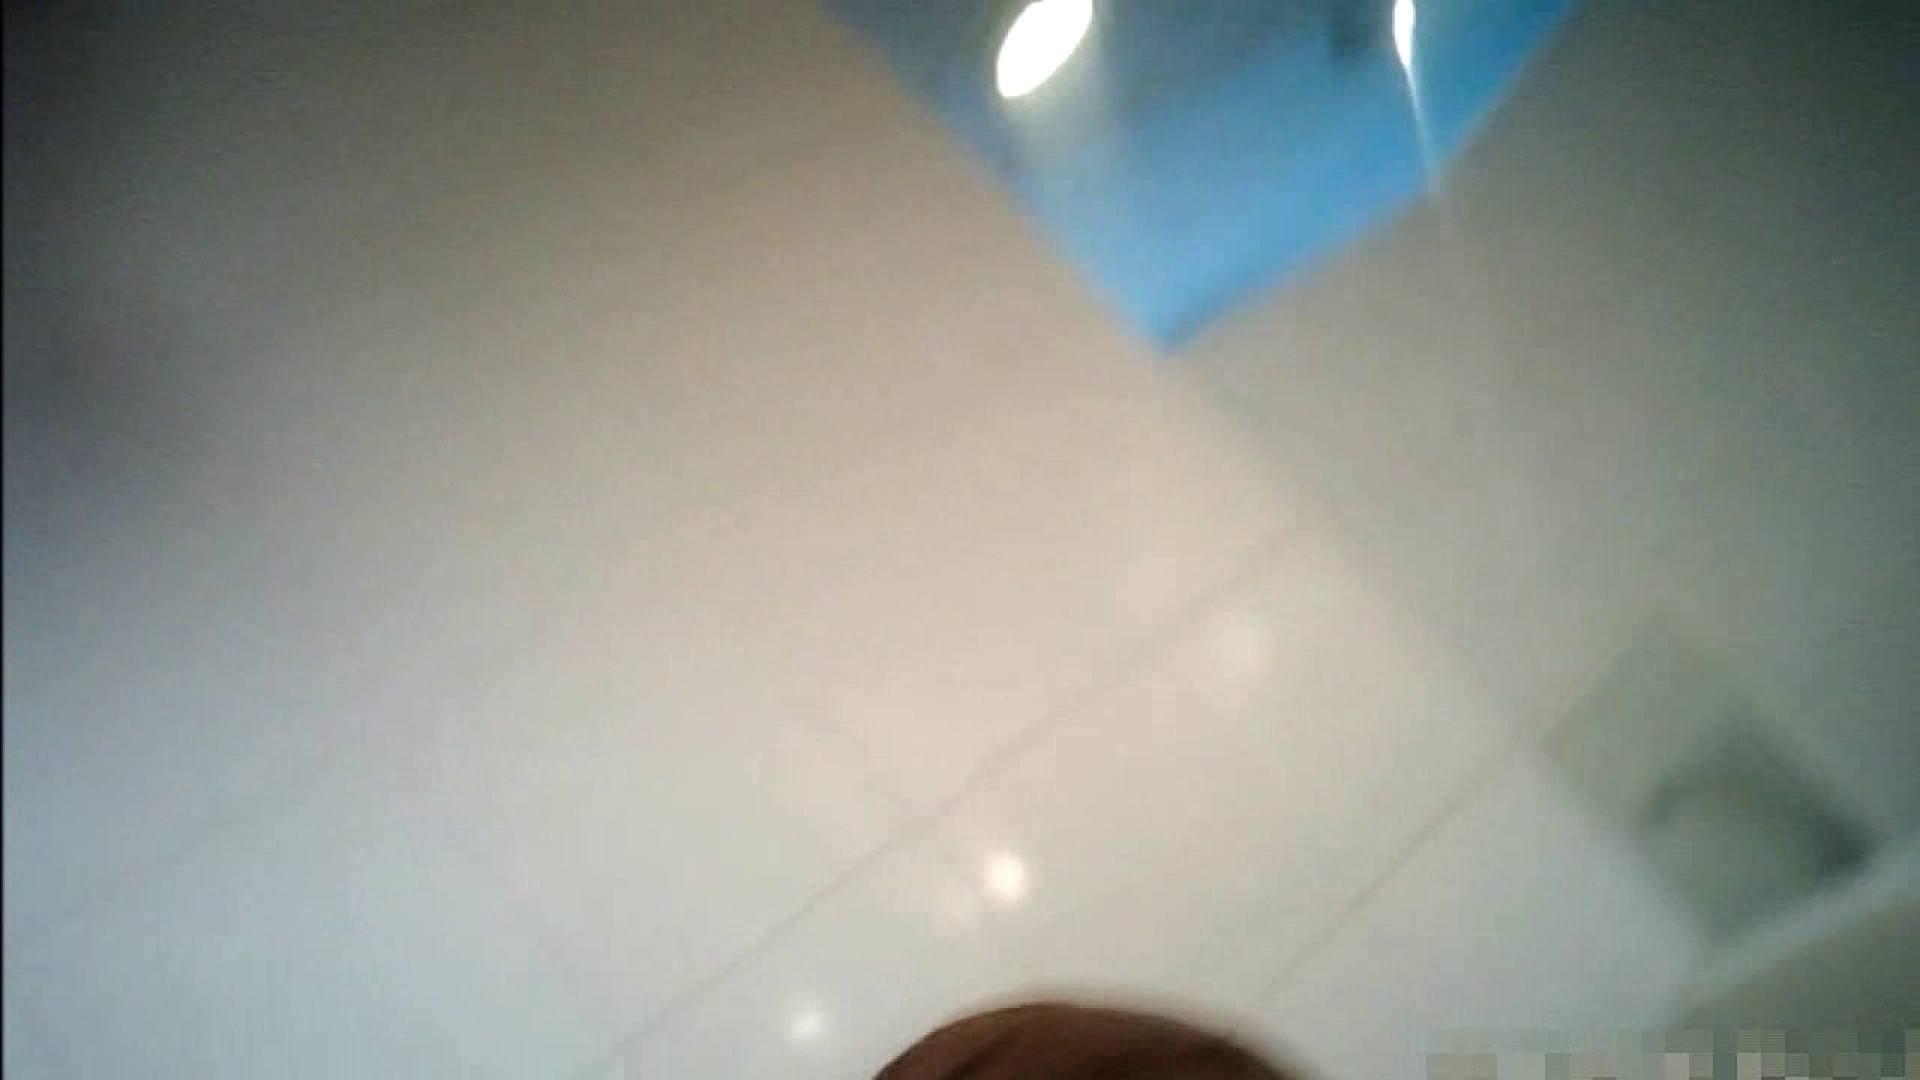 vol.7 【Mちゃん(入浴)】ブランド品査定士19歳 巨乳ギャル 巨乳 AV動画キャプチャ 99枚 84